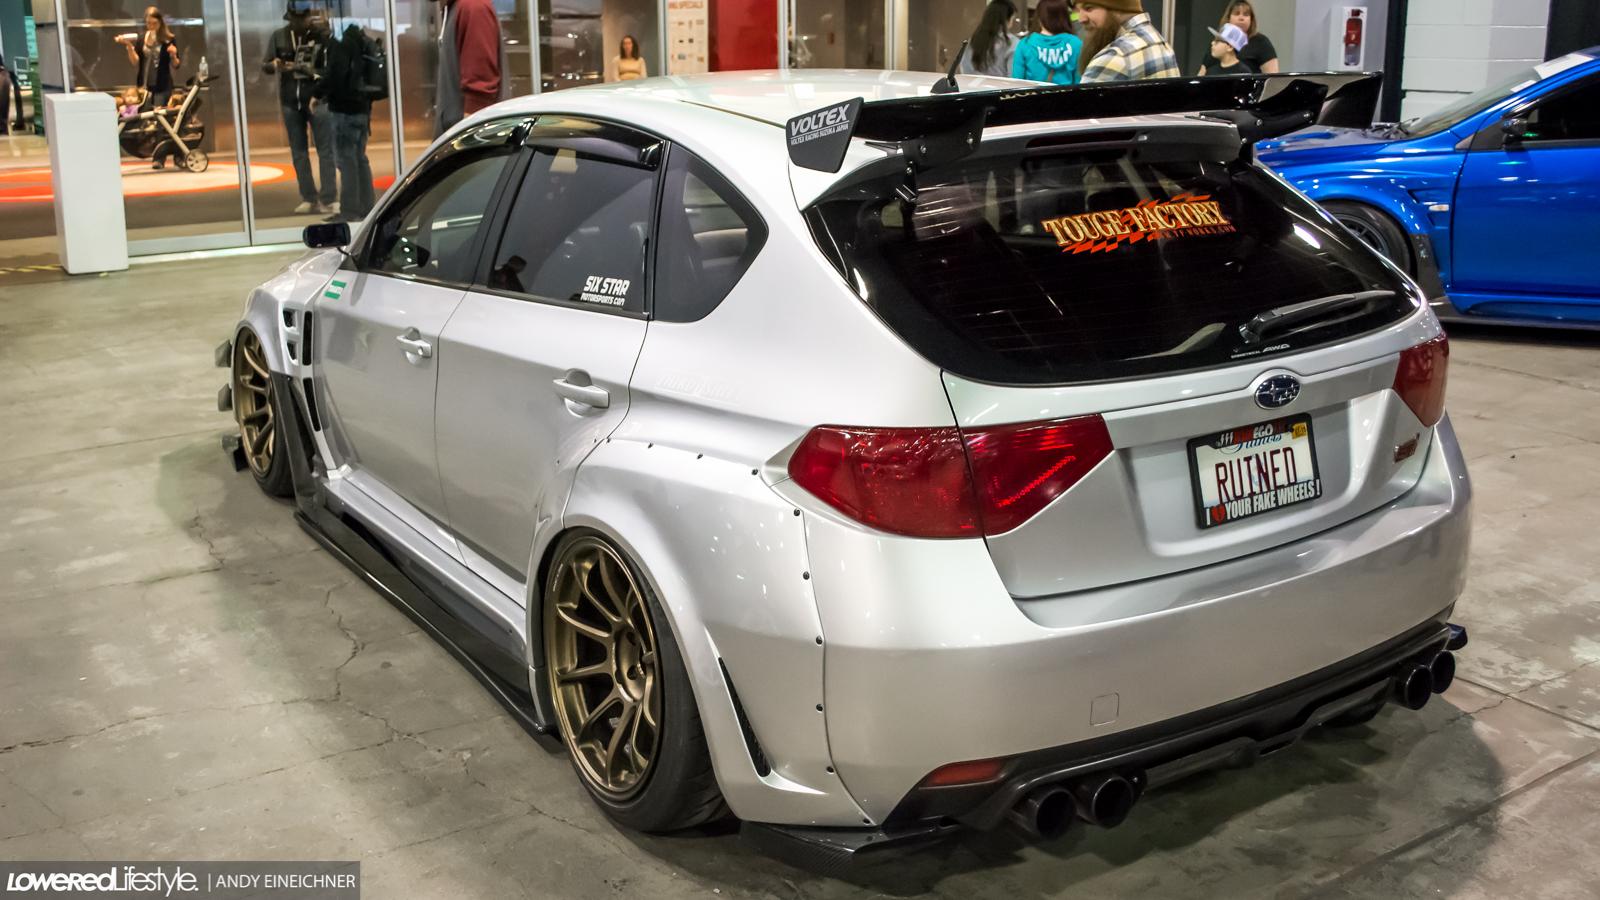 Subaru STI hatch